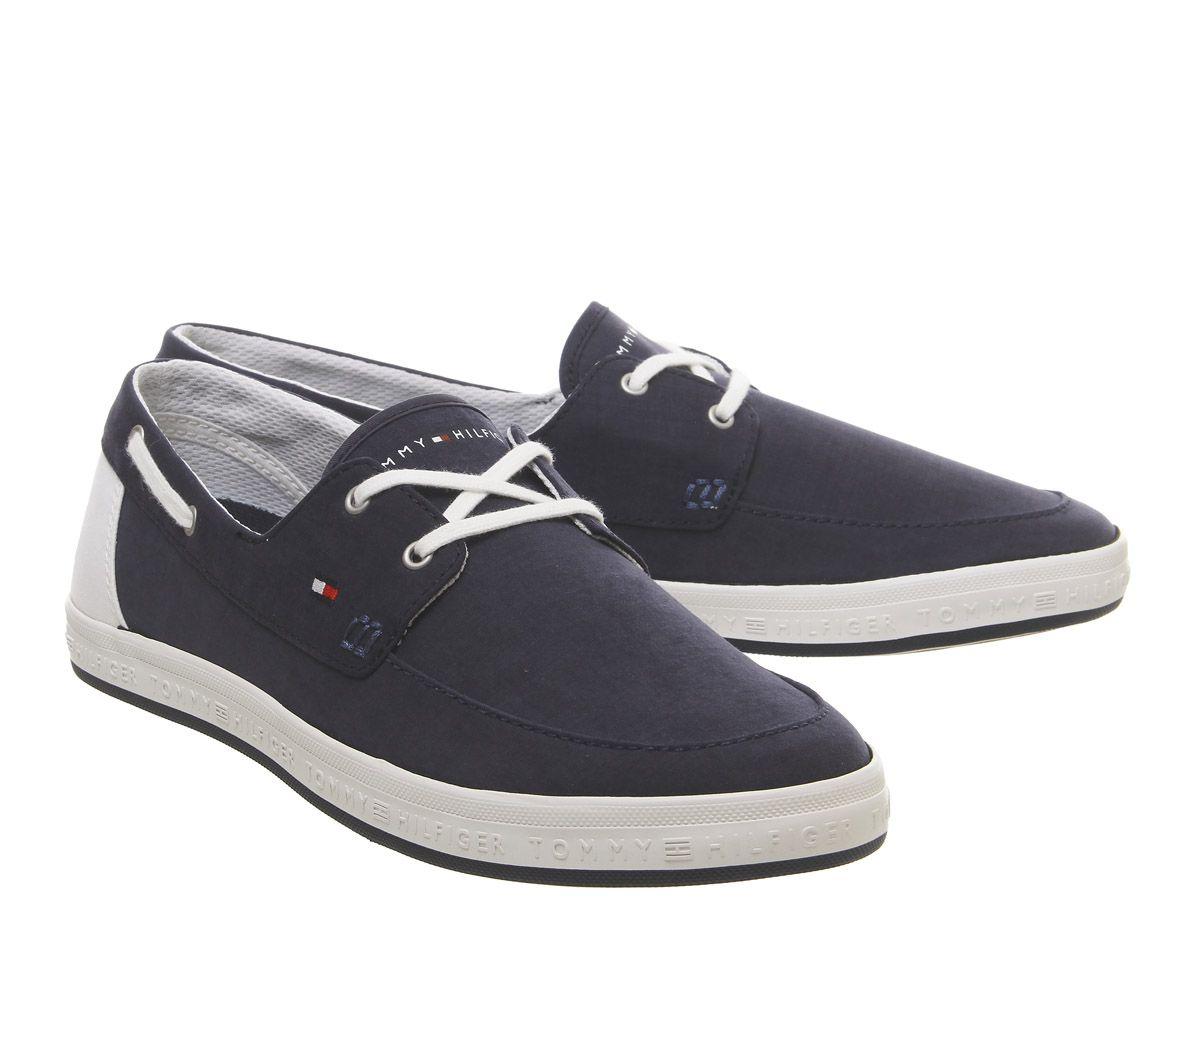 Homme-Tommy-Hilfiger-Howell-Baskets-Minuit-Chaussures-De-Loisirs miniature 6